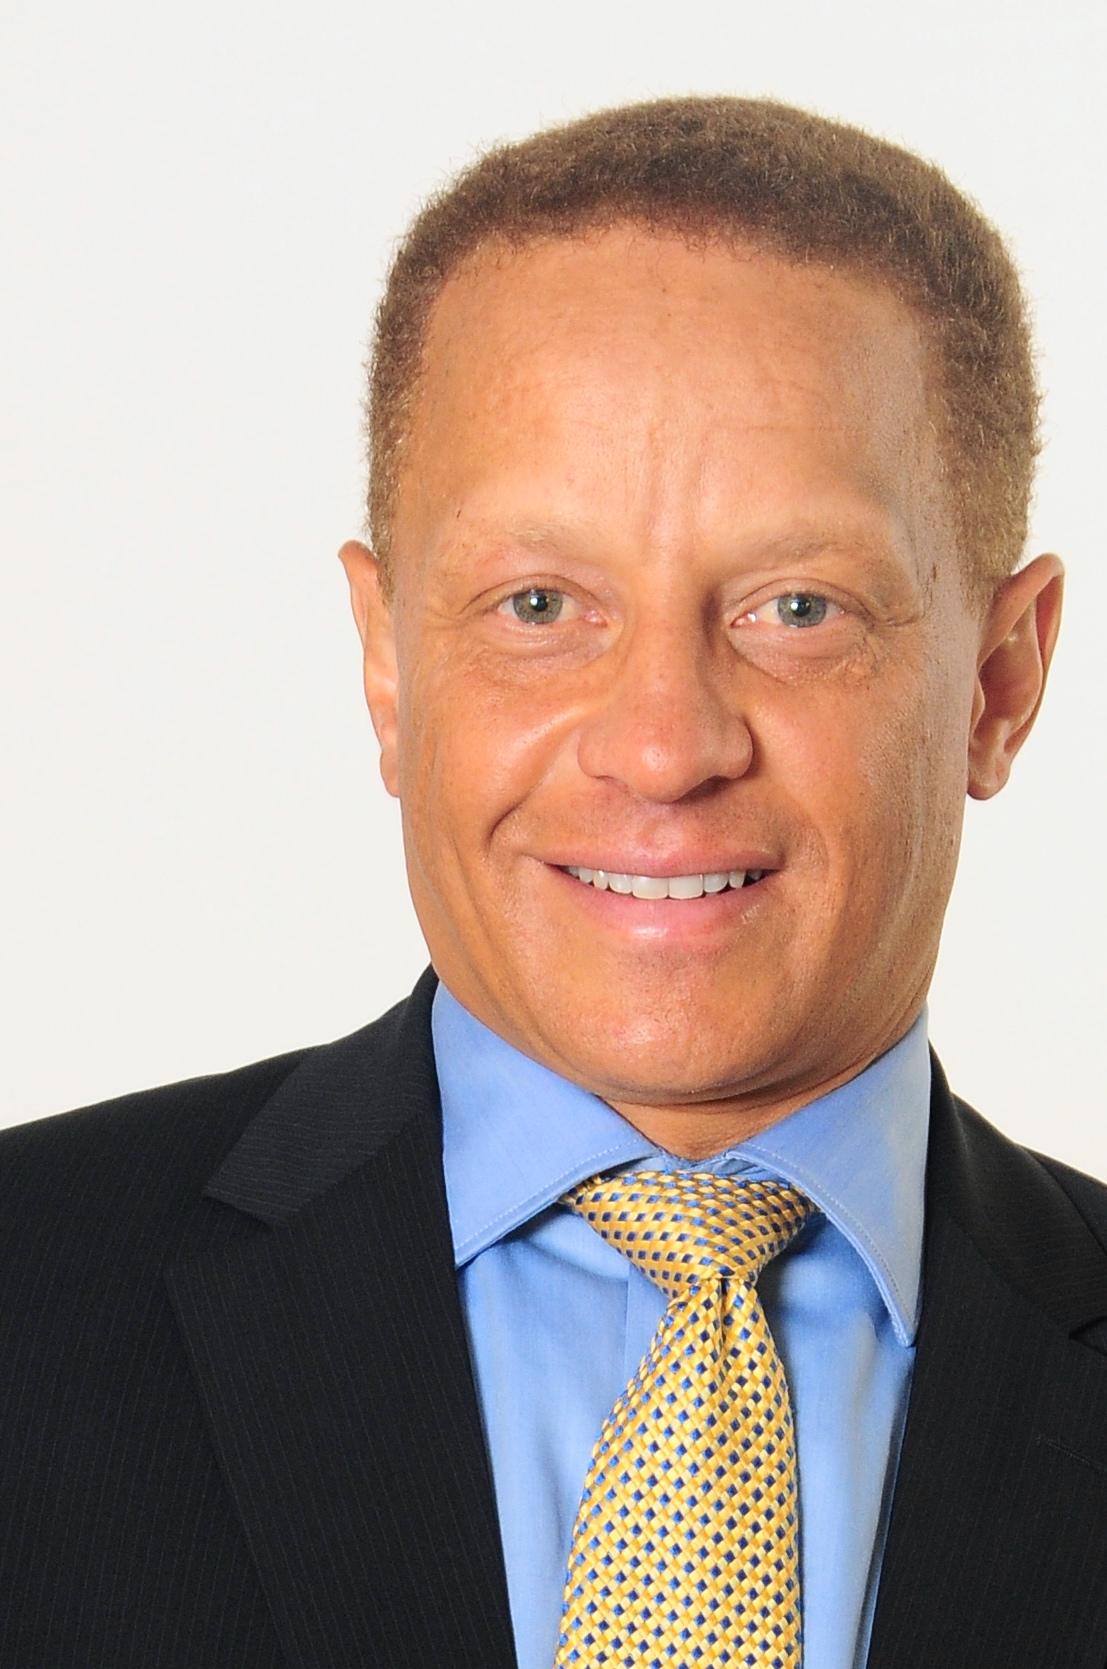 Nicholas Nesbitt, IBM Gneral Manager for East Africa